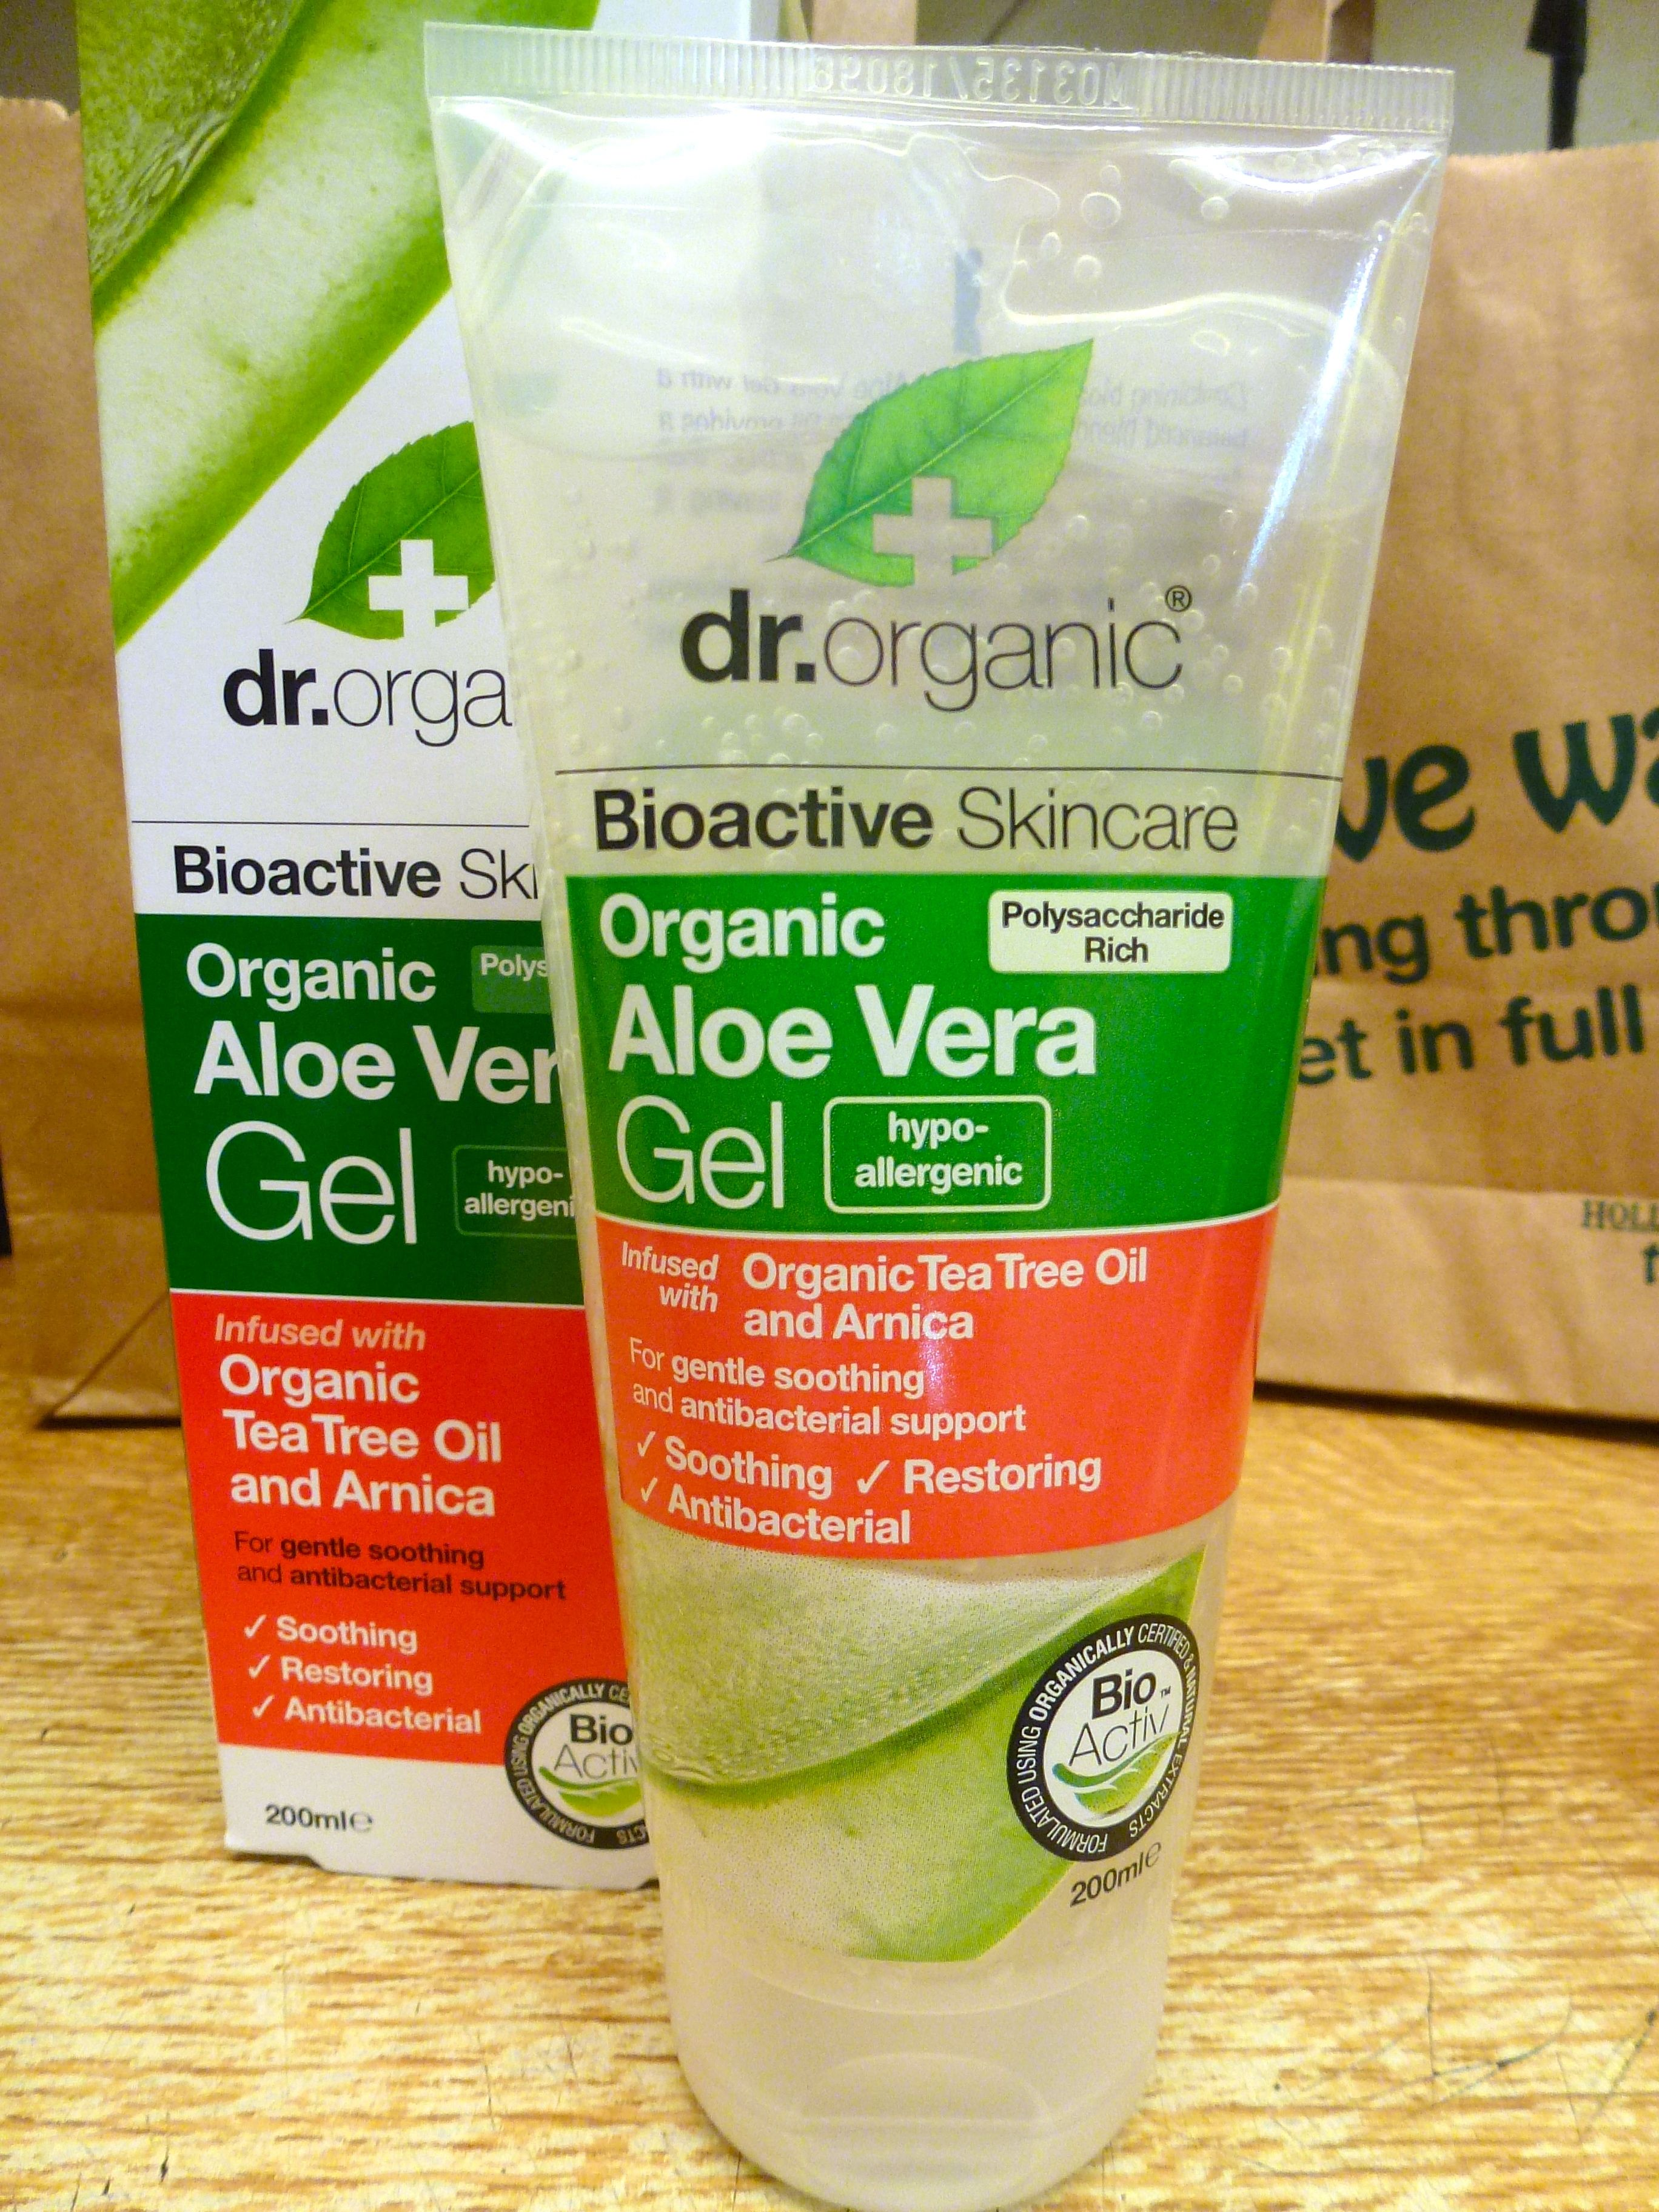 Dr Organic Organic Aloe Vera Gel In 2020 Organic Aloe Vera Gel Organic Aloe Vera Aloe Vera Gel